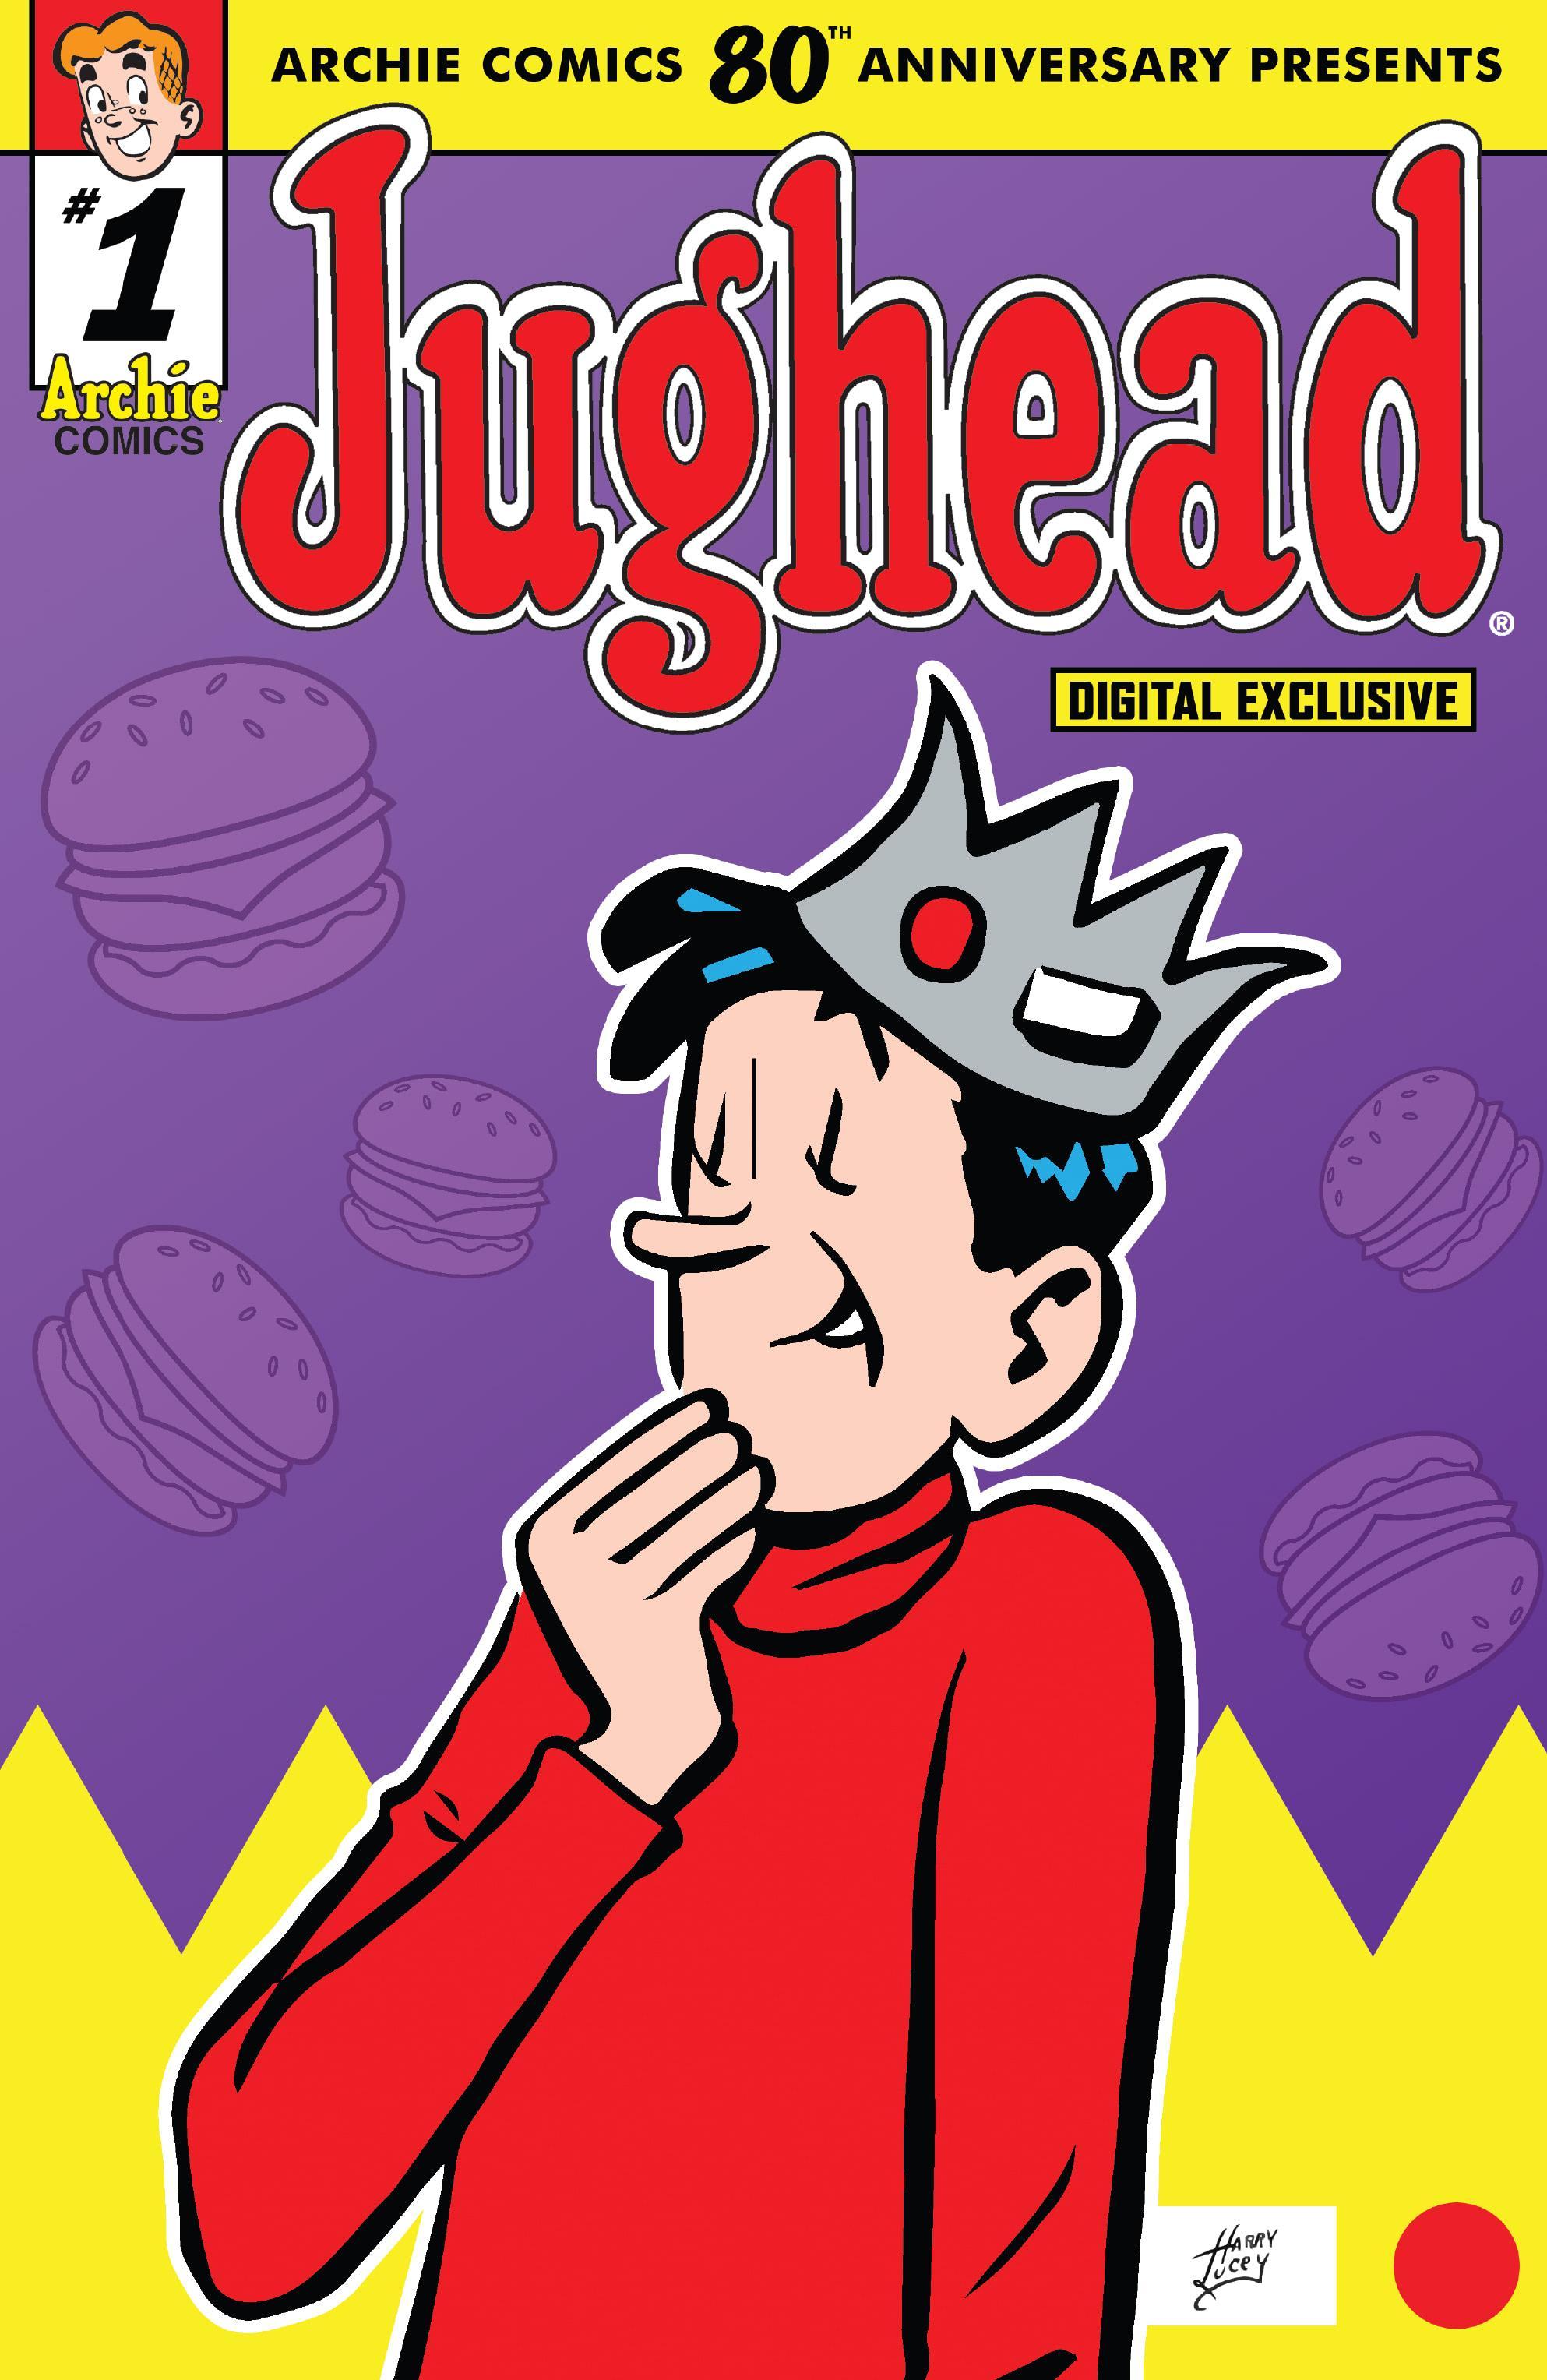 Archie Comics 80th Anniversary Presents 004-Jughead 2020 Forsythe